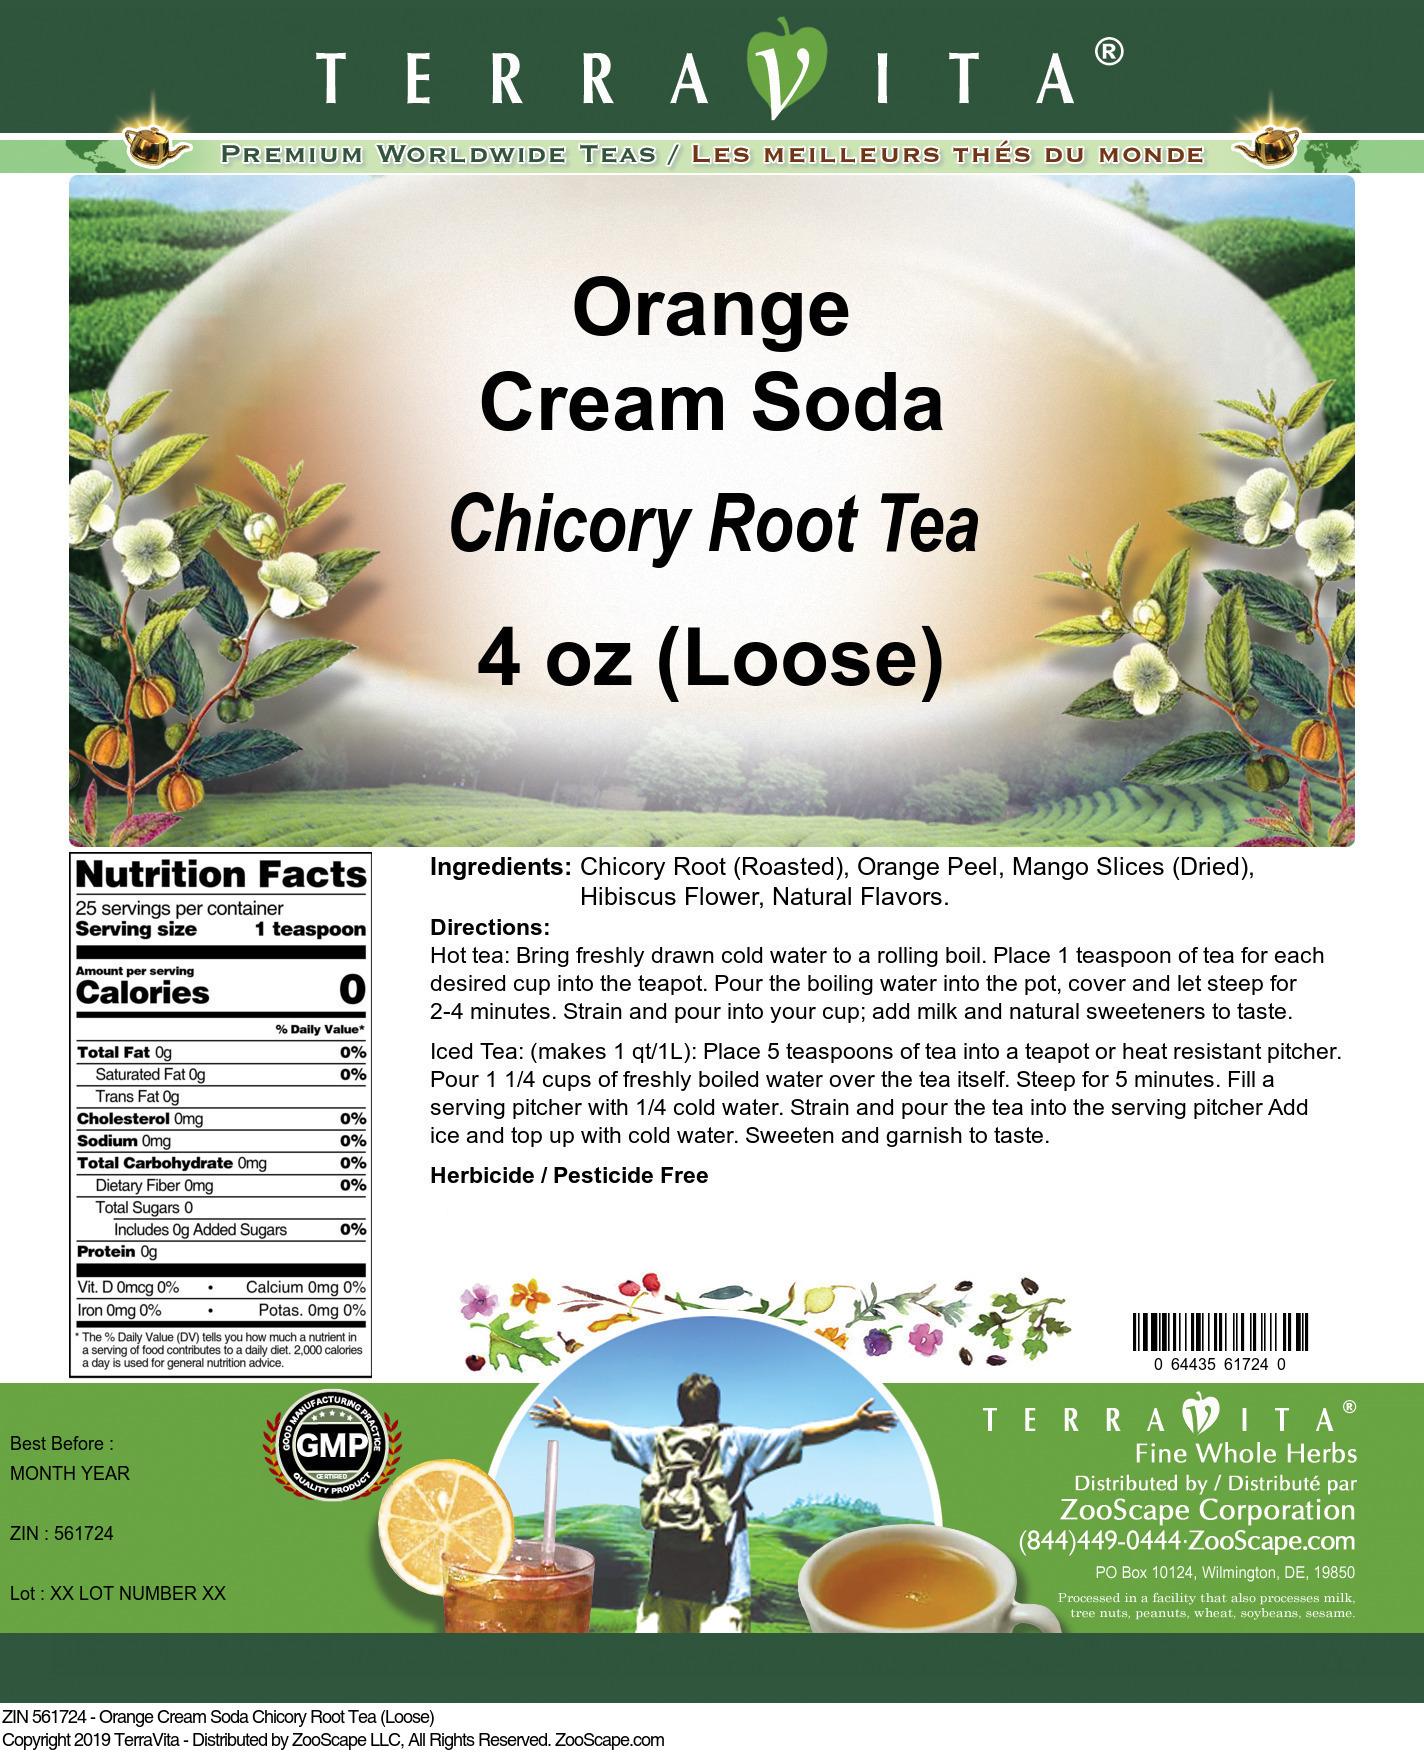 Orange Cream Soda Chicory Root Tea (Loose)